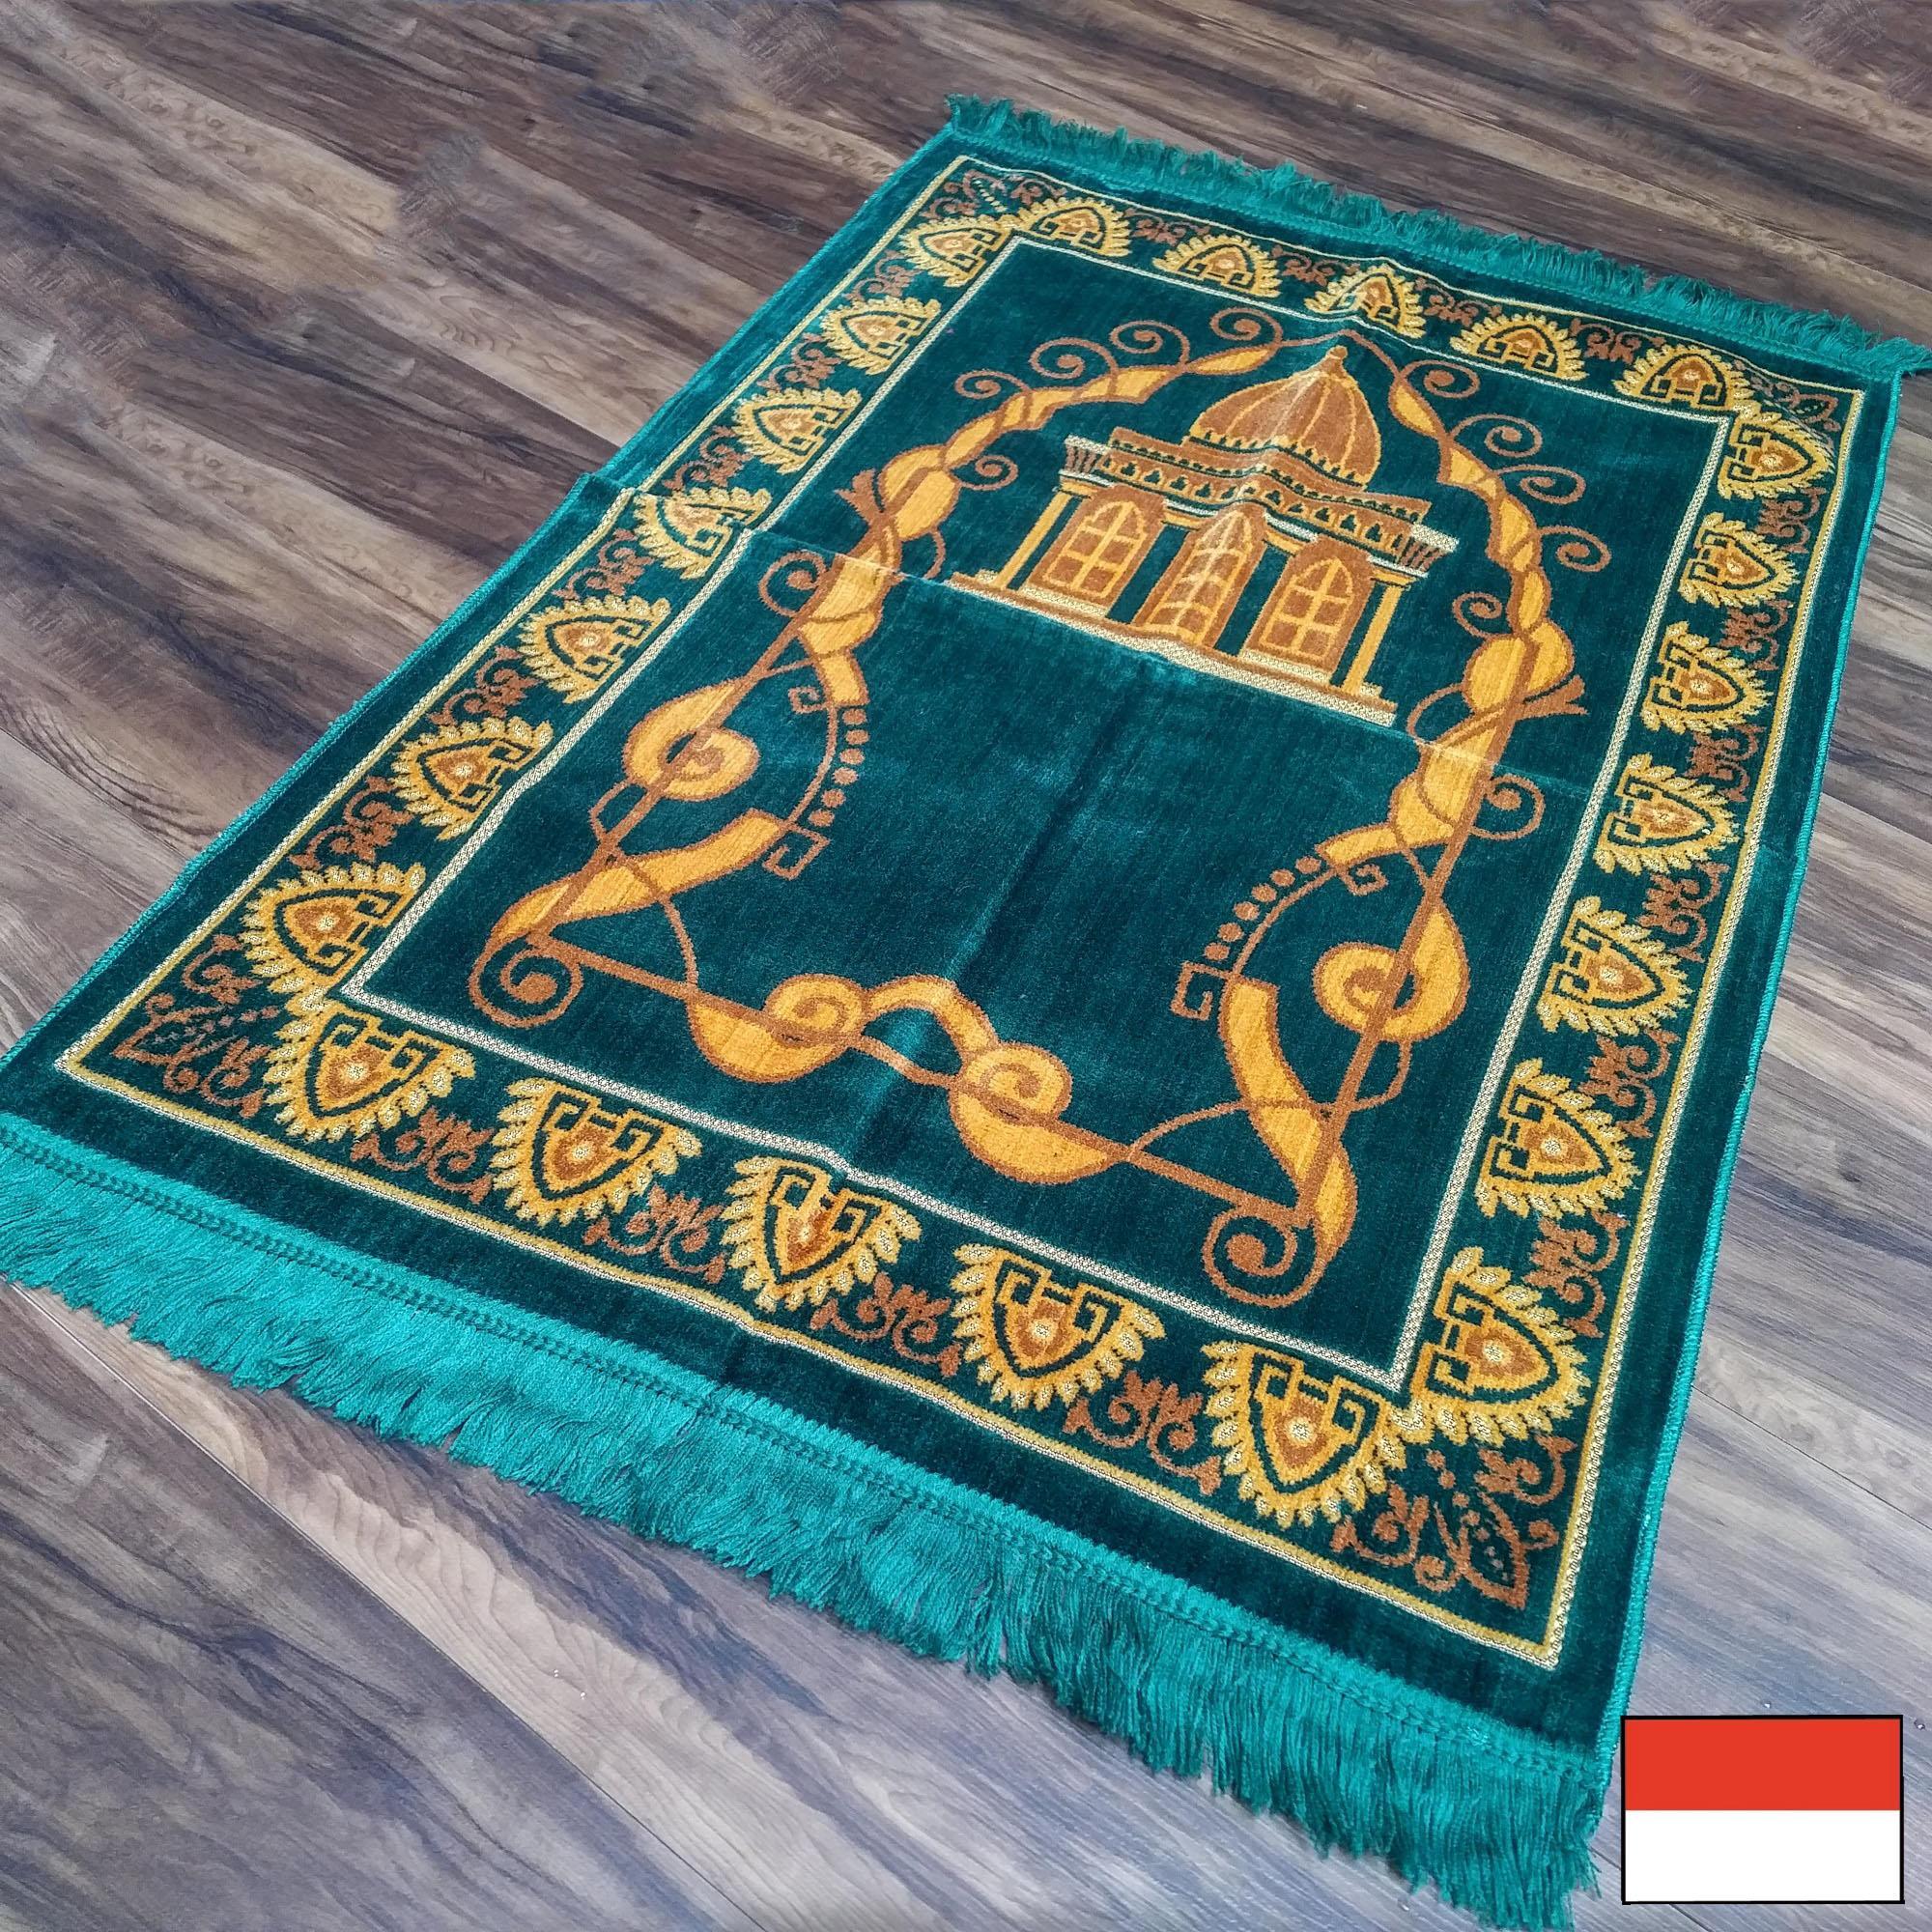 Nurtex - Sajadah Turki Beludru / Bulu Normal 70 cm x 110 cm - Hijau Masjid